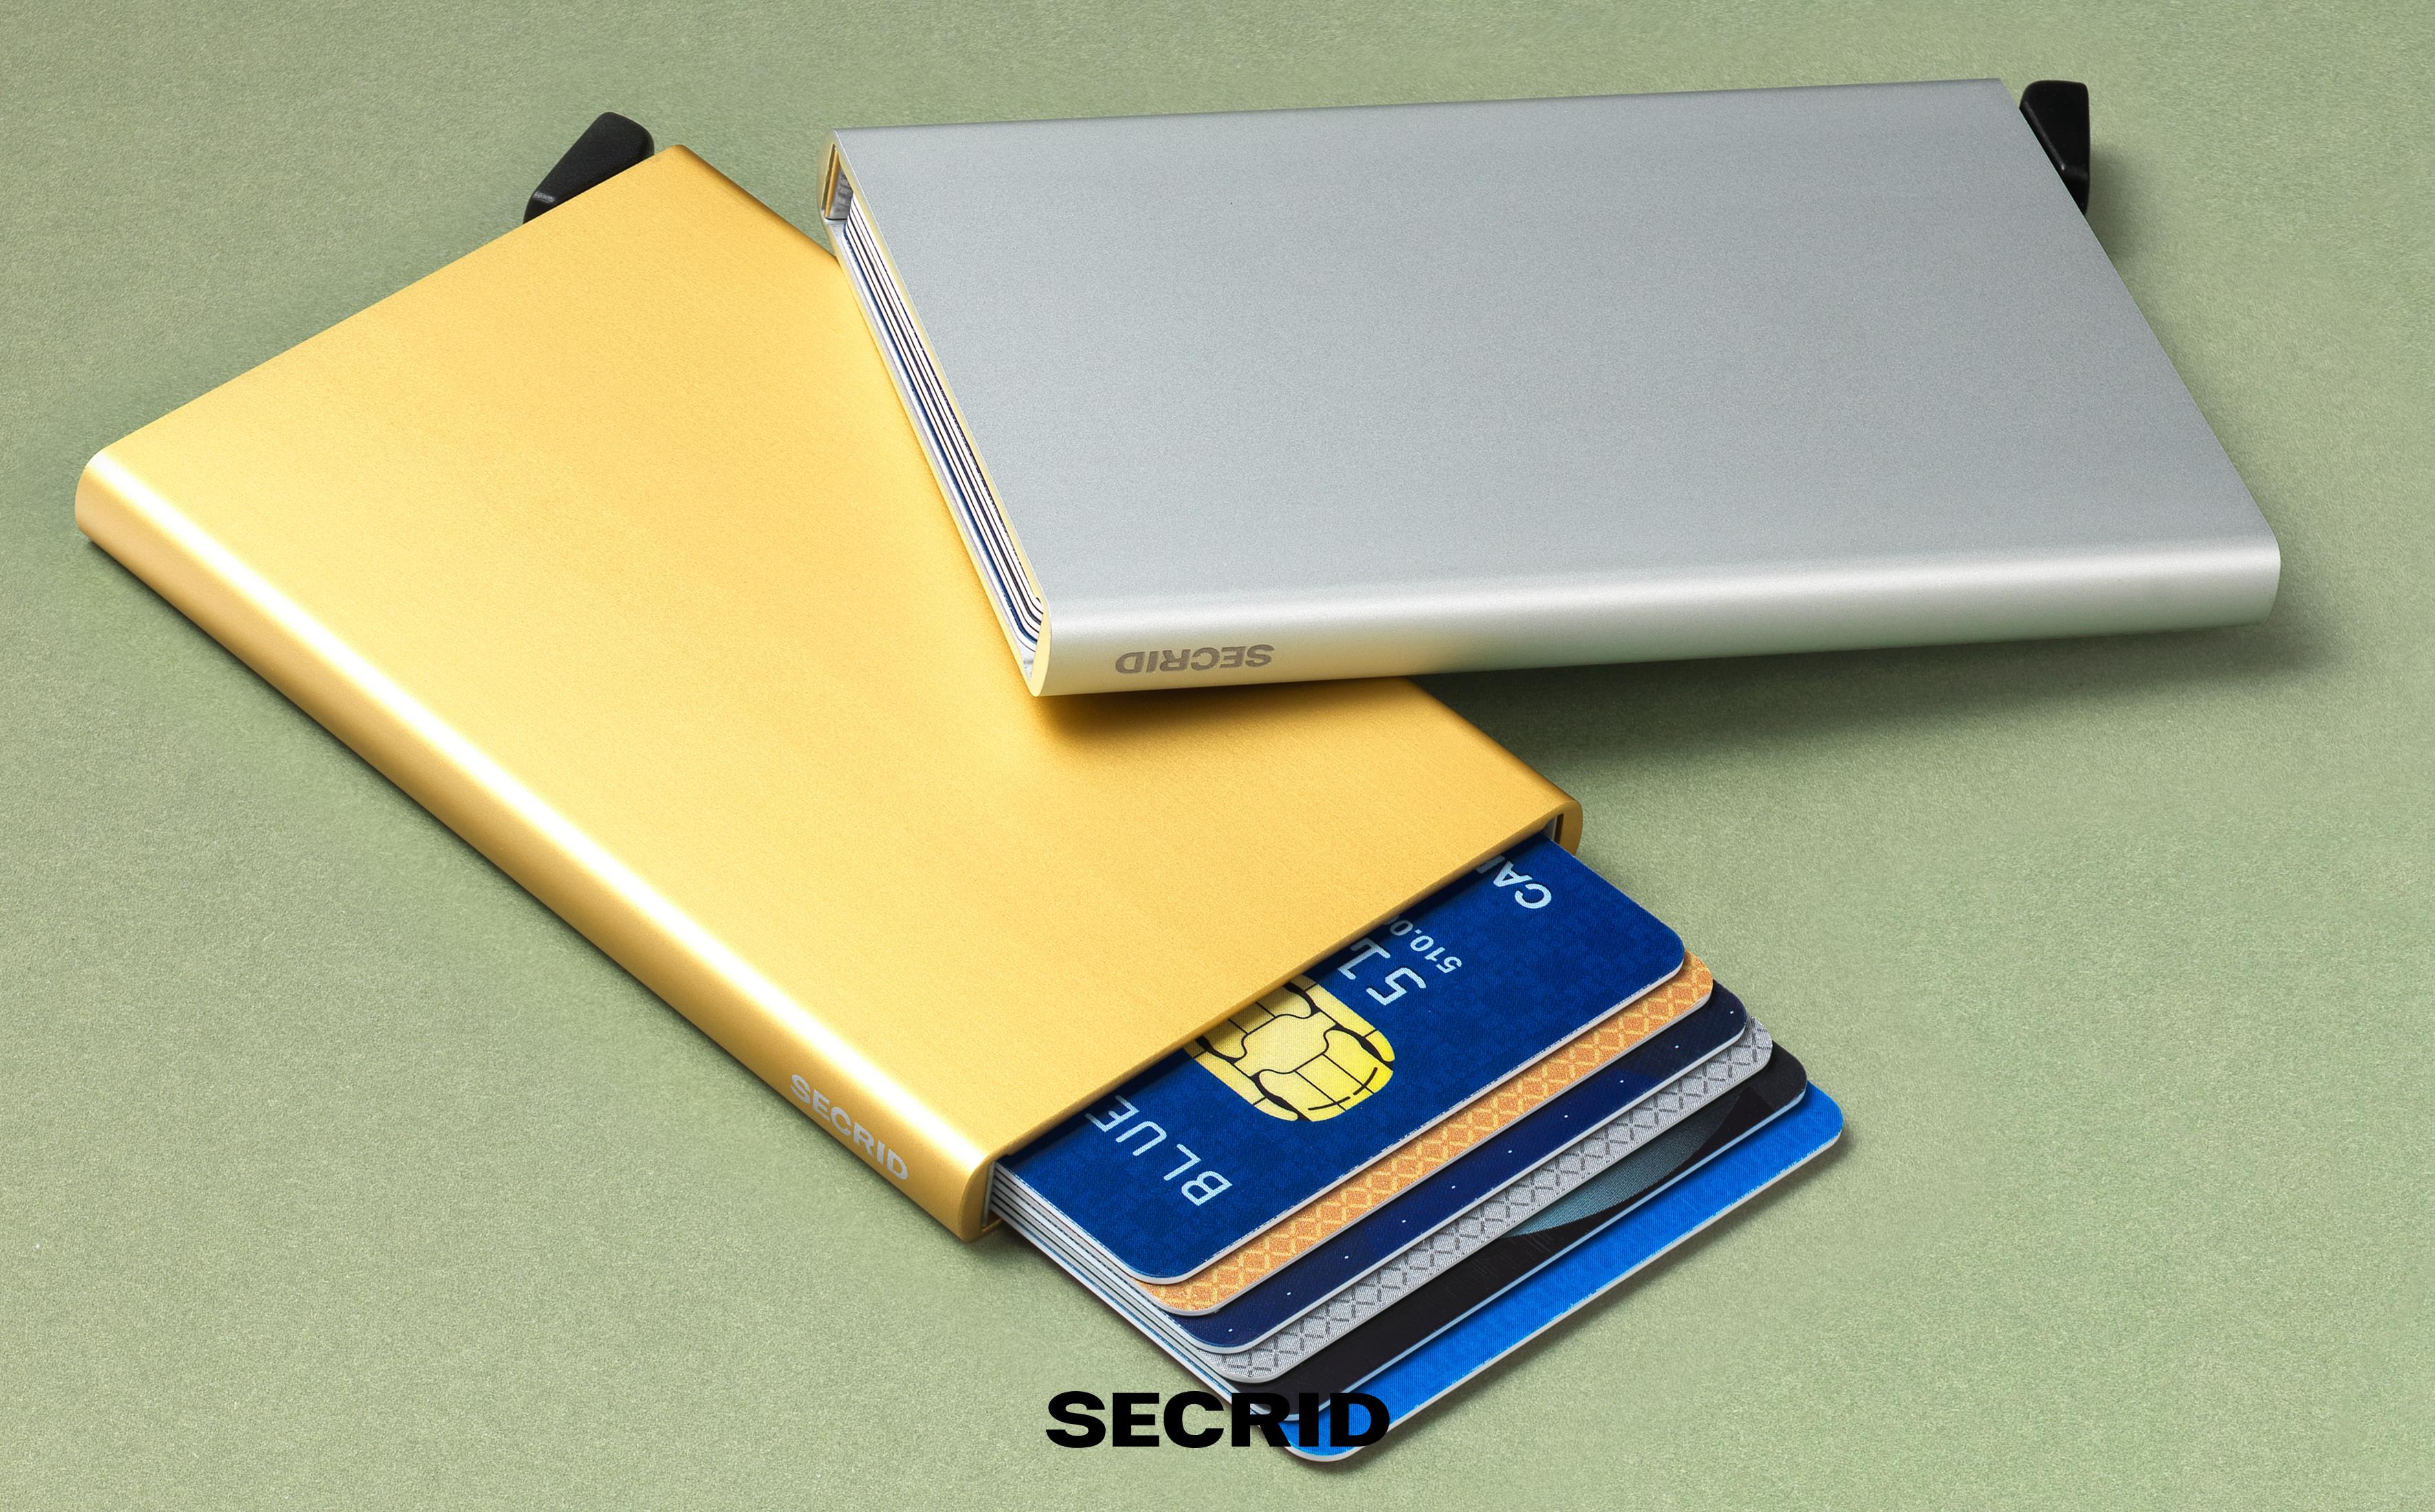 Secrid Cardprotector - TravelSmarts